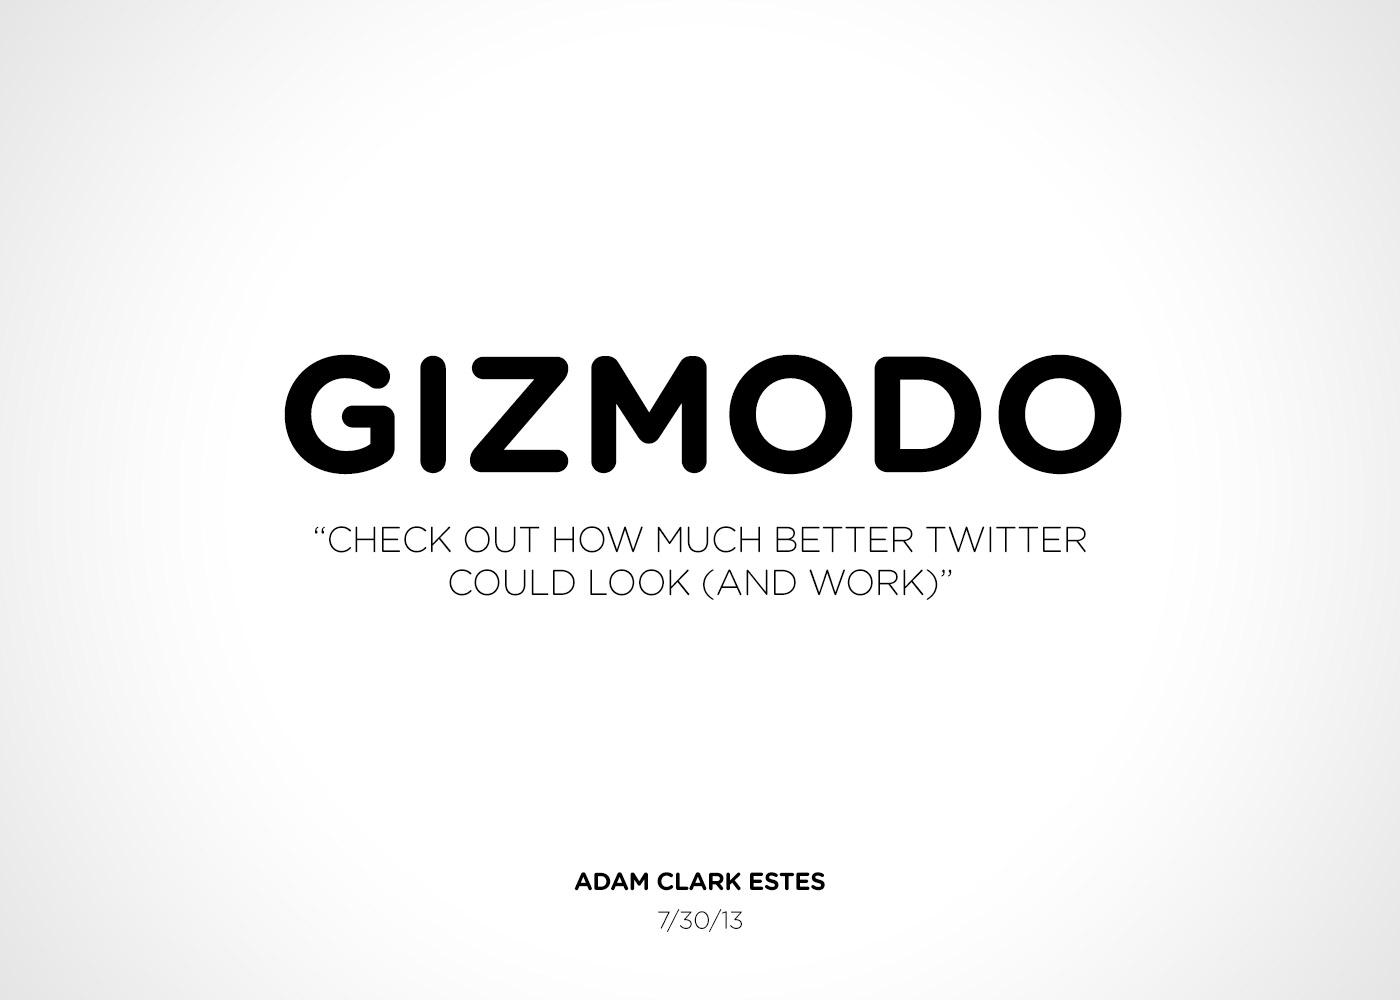 Gizmodo-article-1